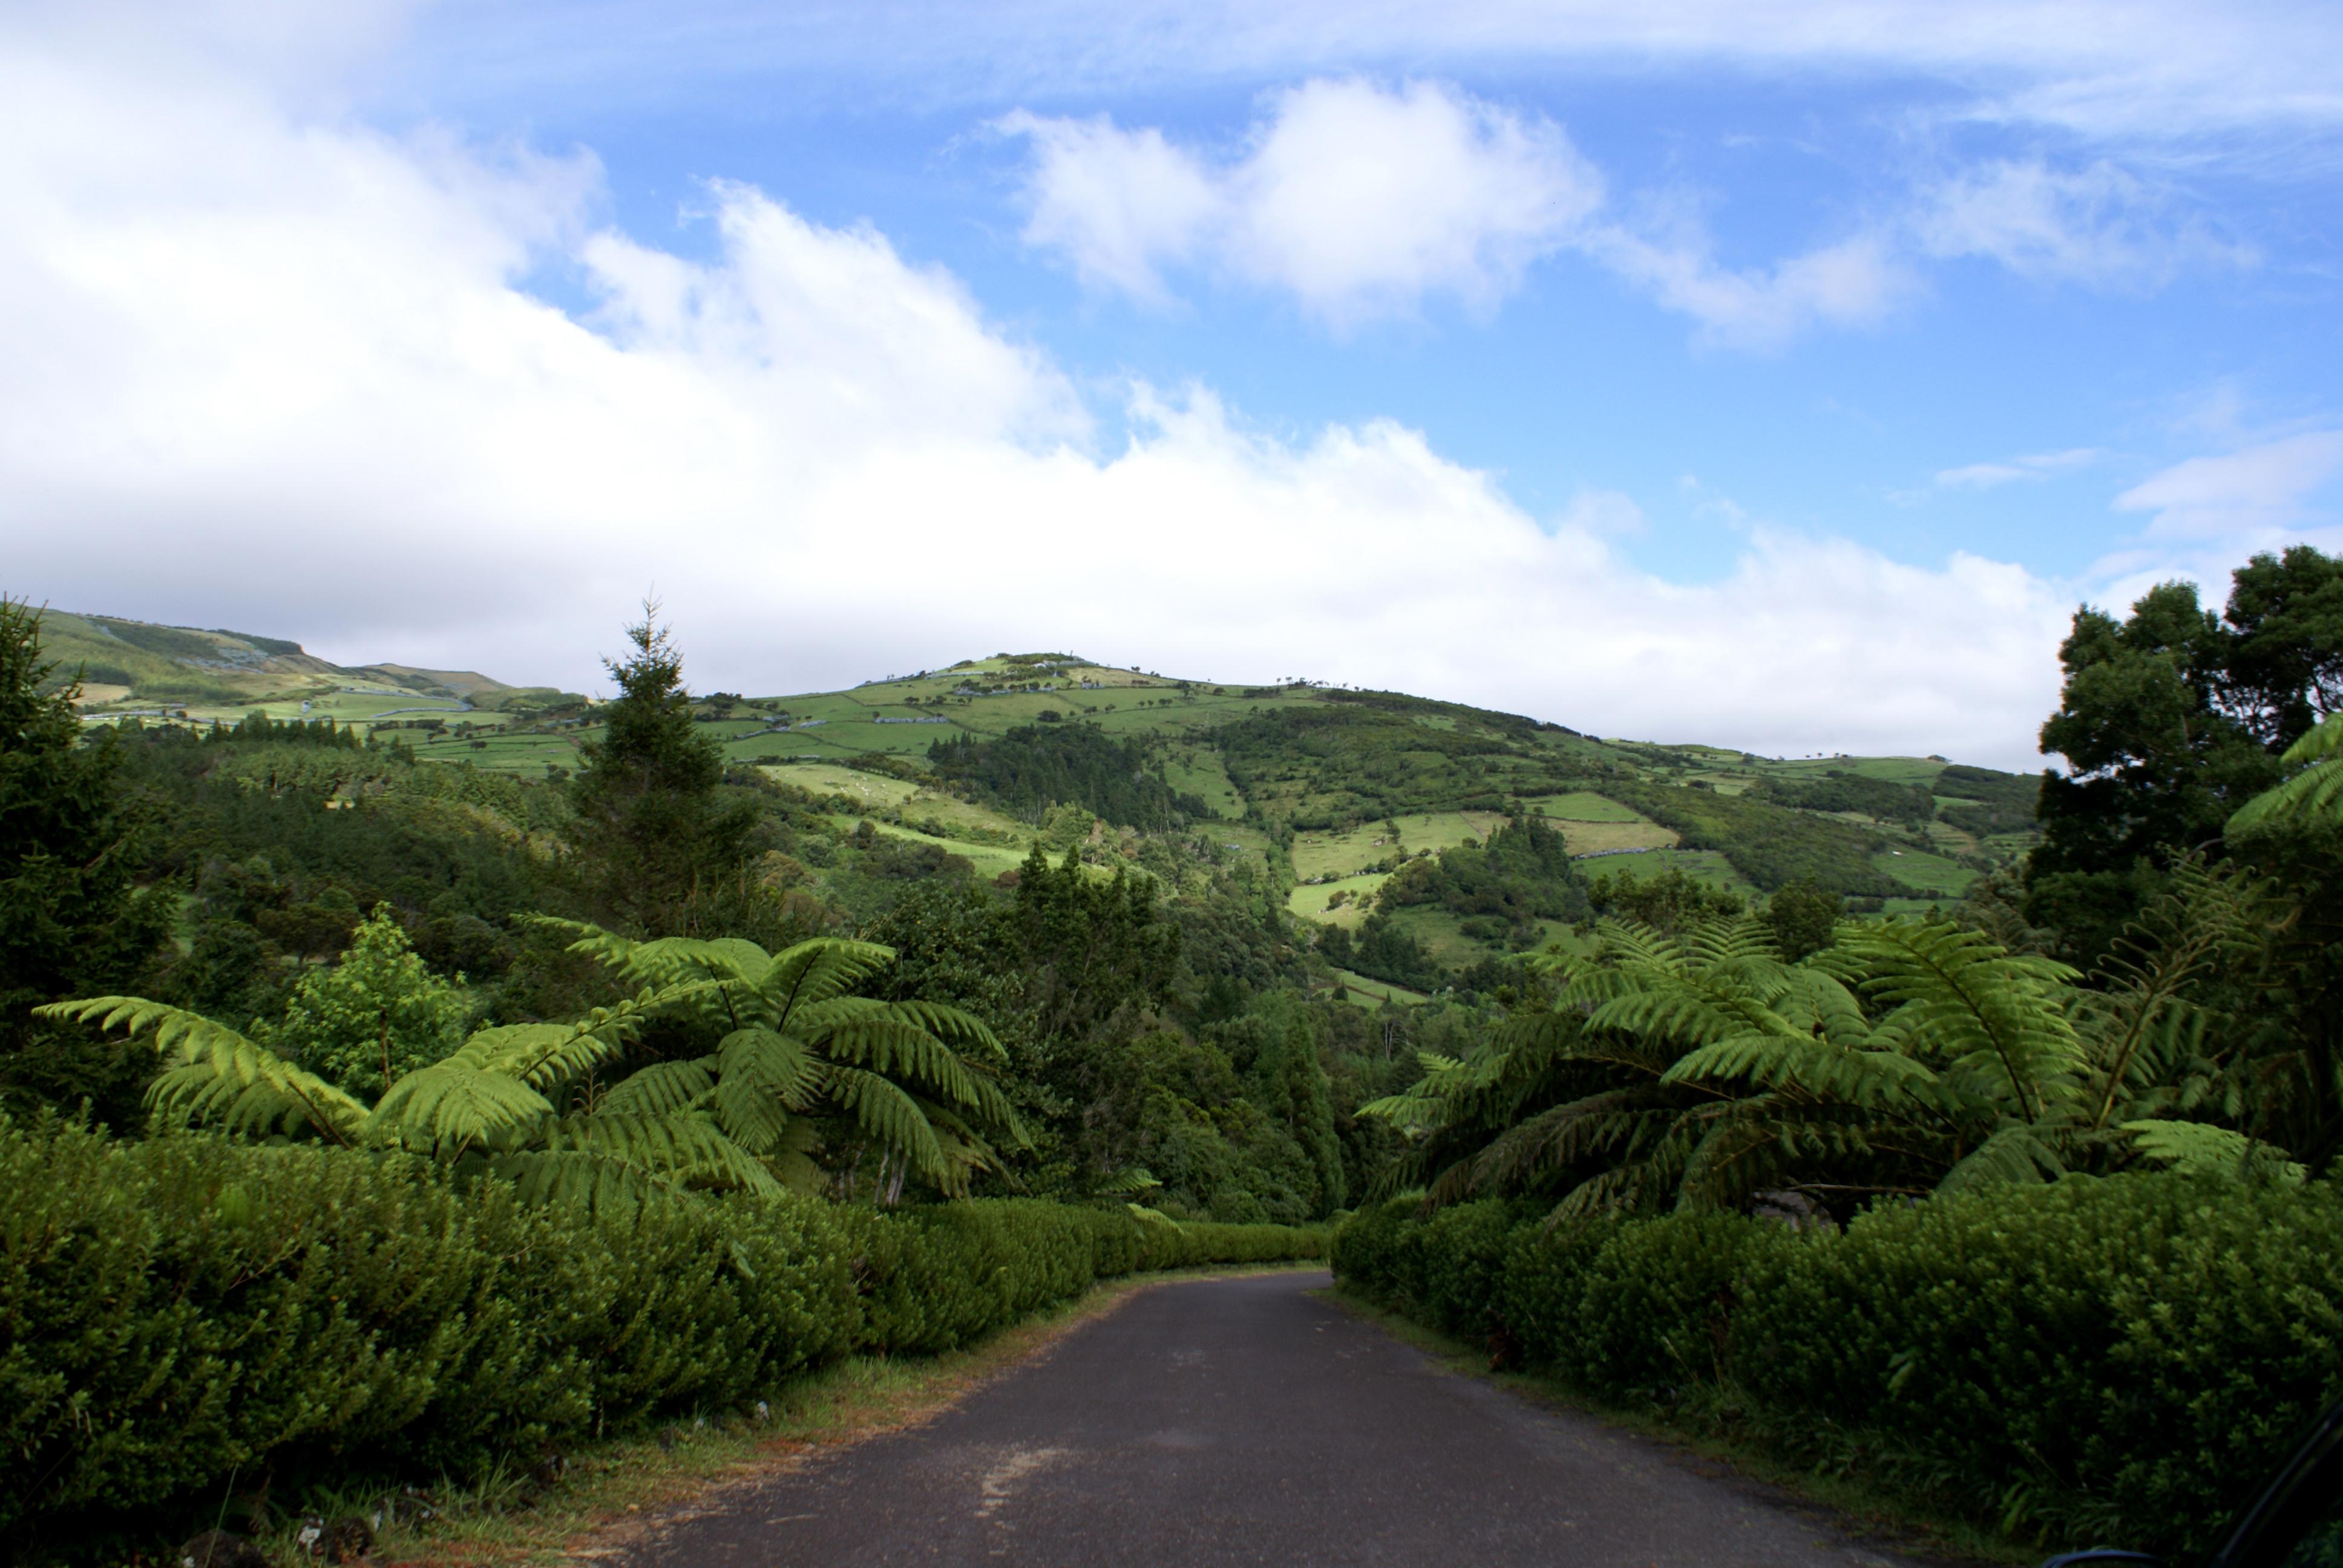 Reserva Florestal de Recreio da Silveira